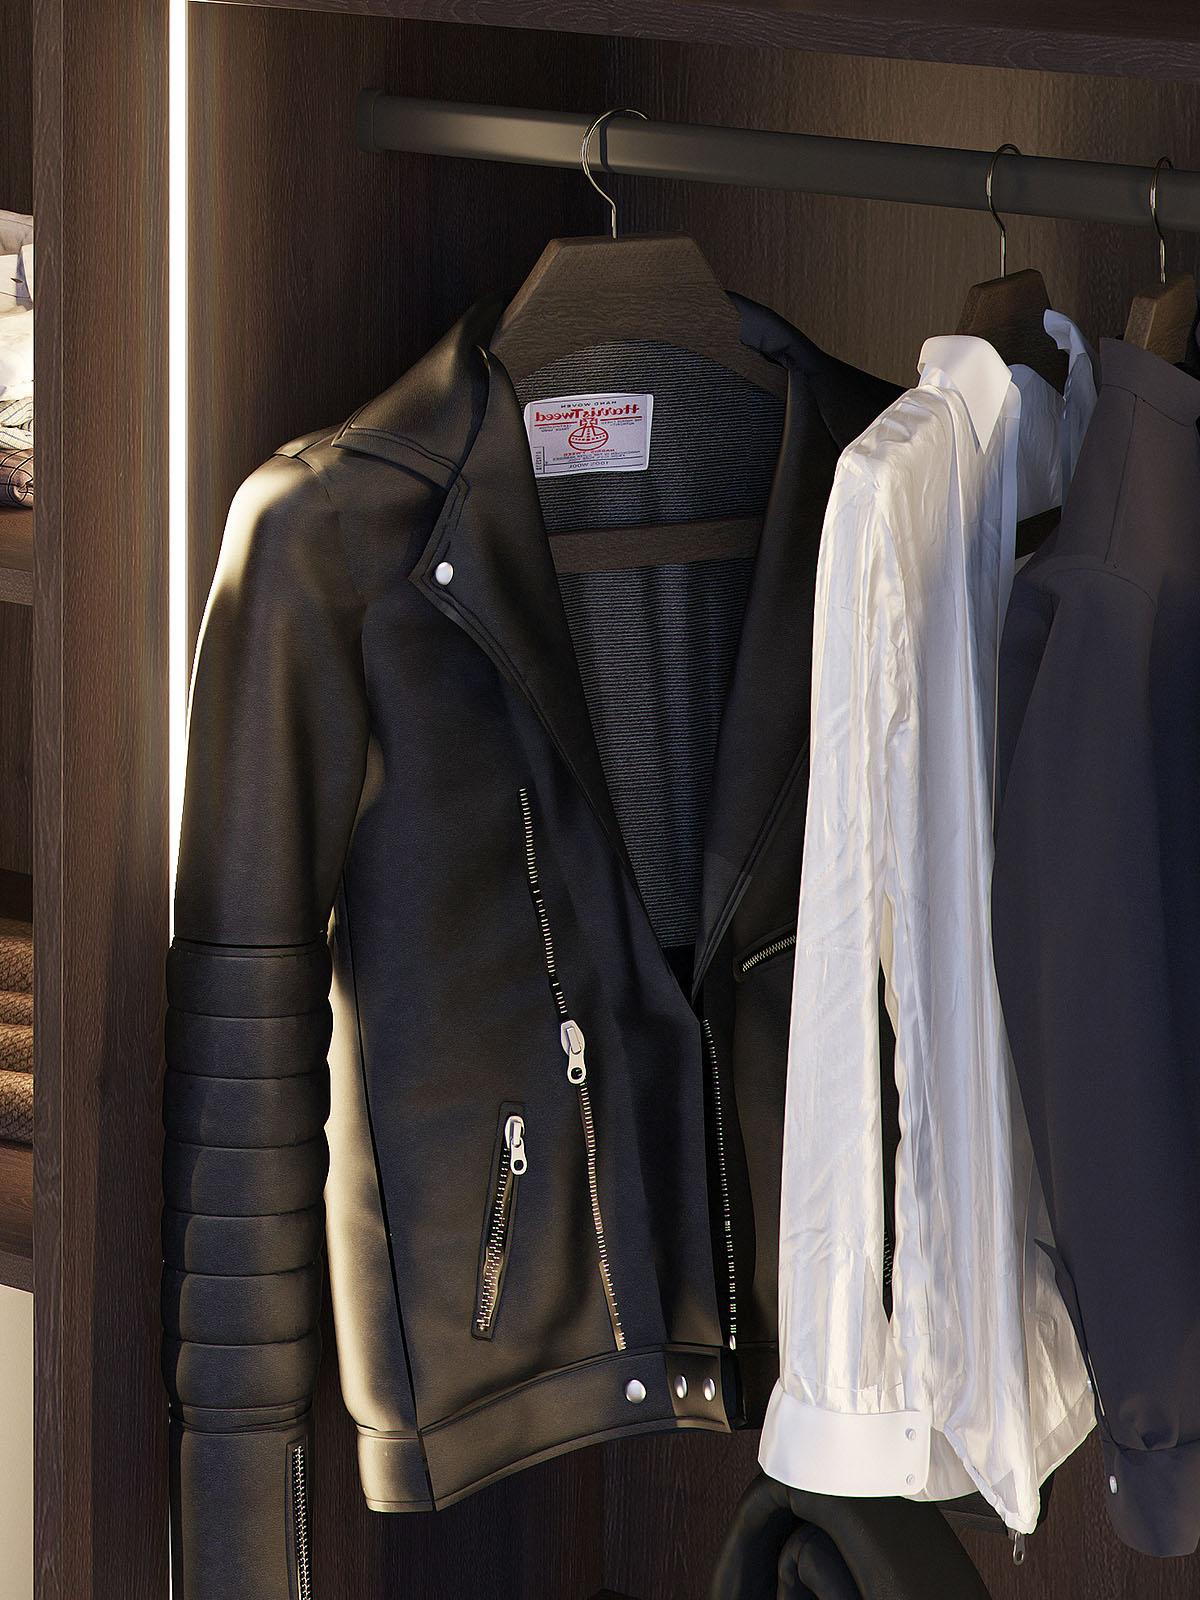 jackets-hanging-closet